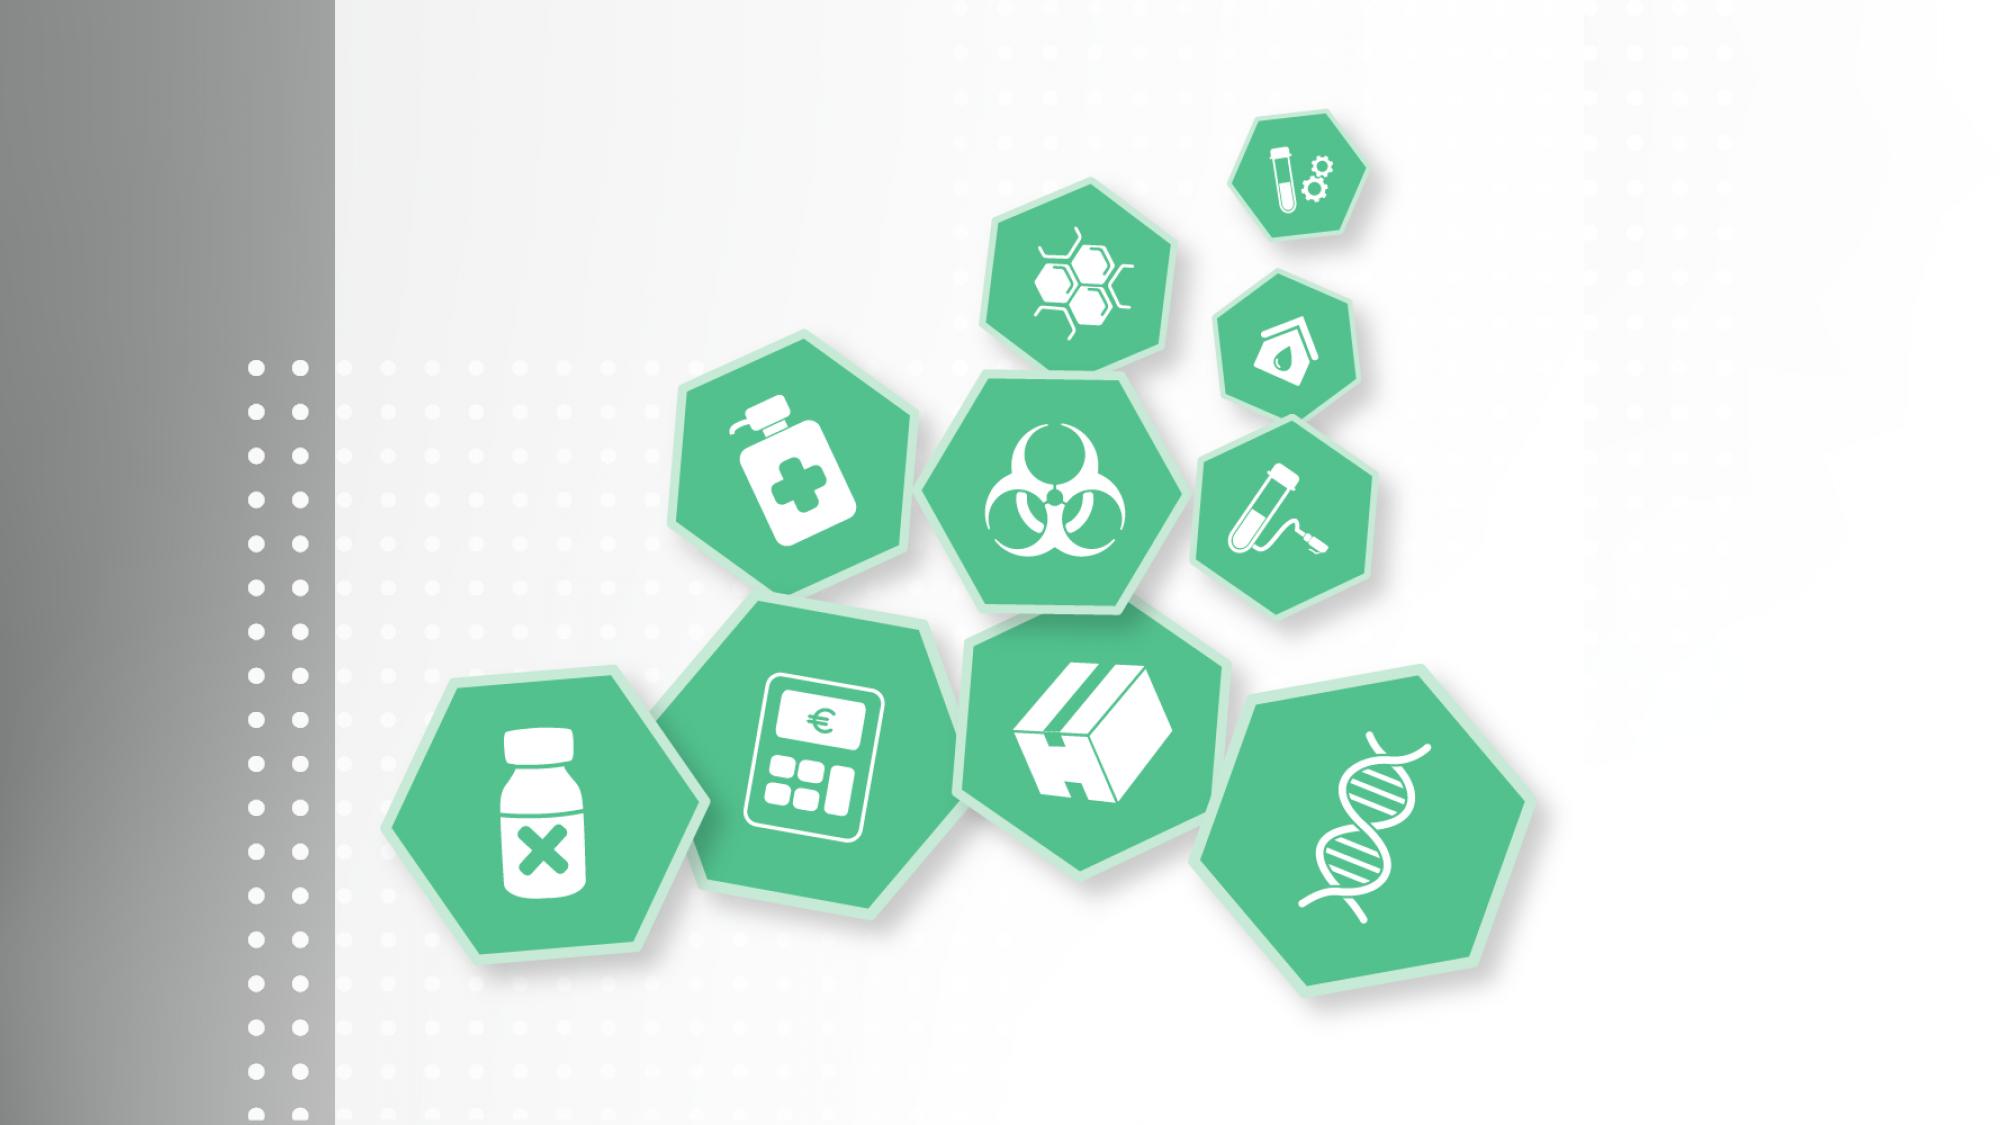 Icons der Medat Module, z.B. Mikrobiologie, Humangenetik, Blutdepot, Toxikologie, etc.